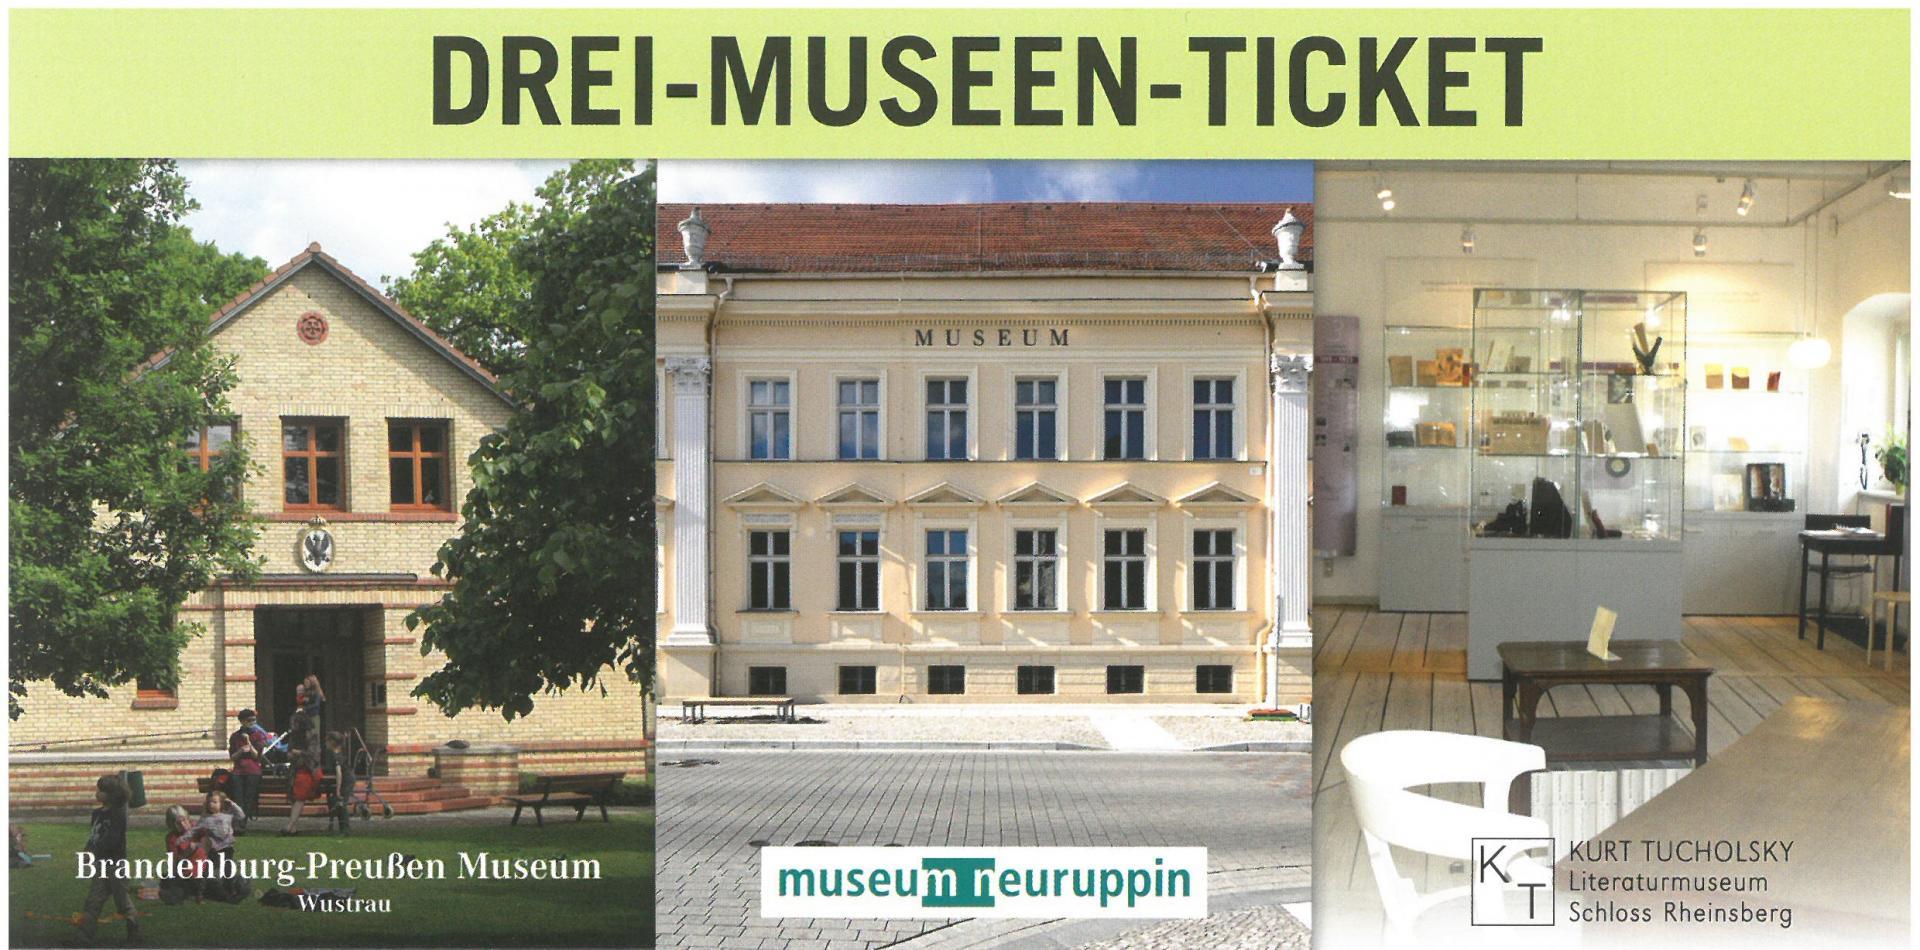 Drei-Museen-Ticket